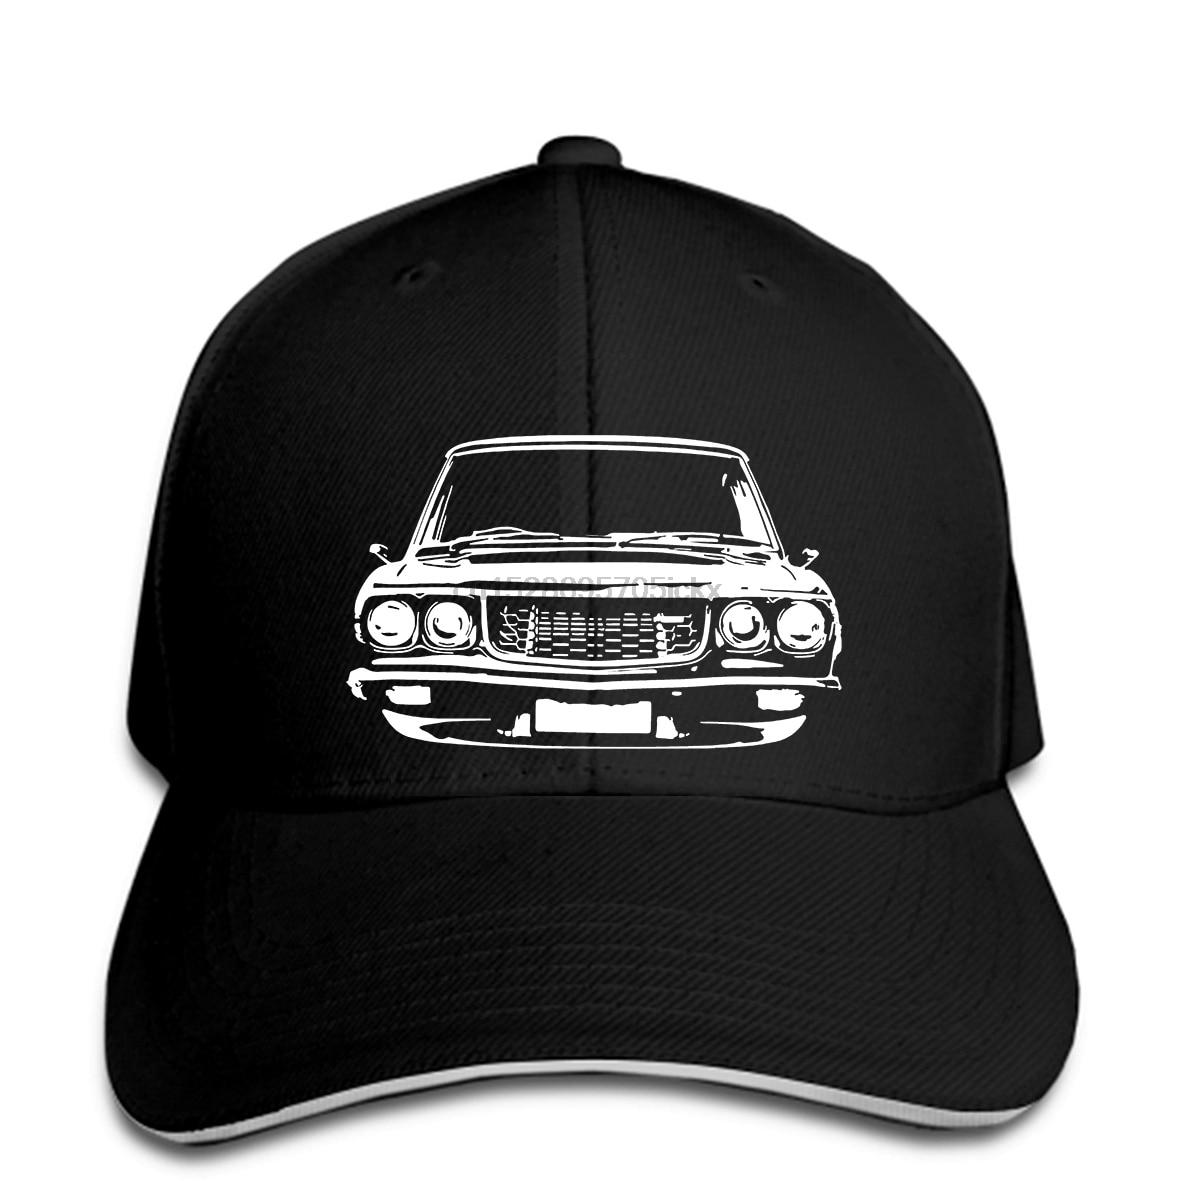 Mazda RX 3 Savanna 10a 12a Rotary Engine S102A S124A RX3 Men Car Tee.jpg_.webp snapback hat Peaked